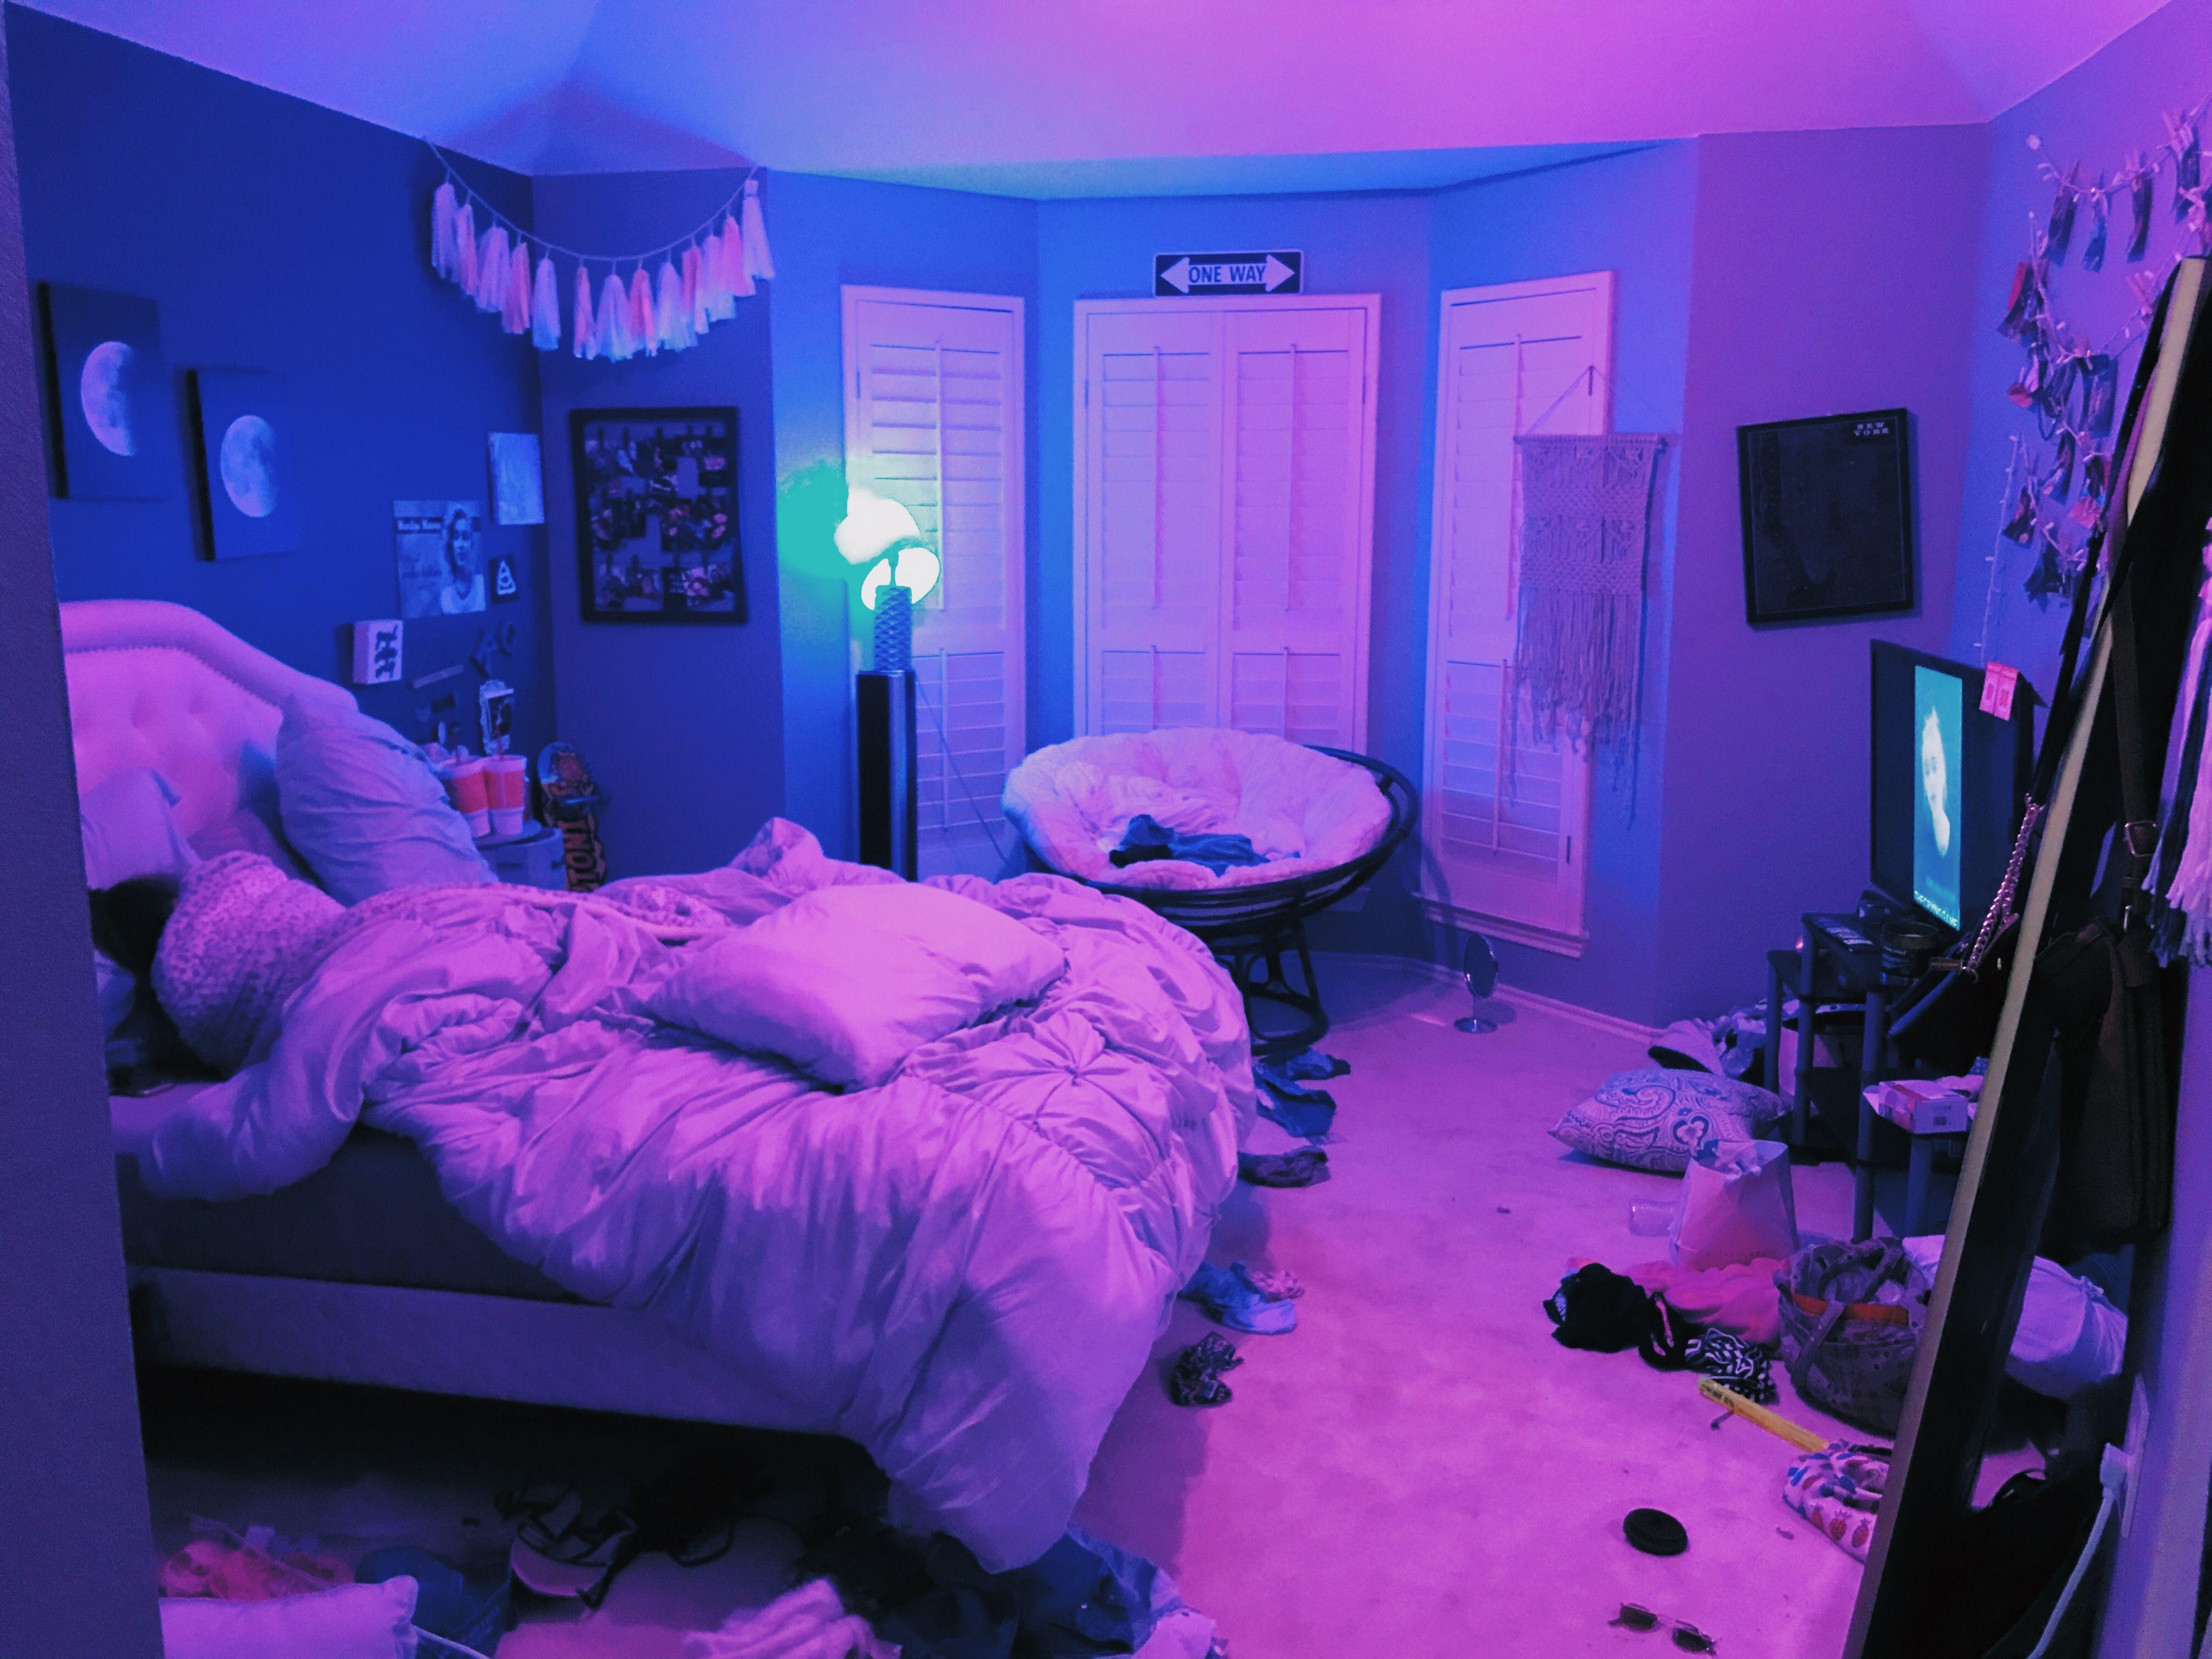 Pin by Farah moudden on room  Neon room, Neon bedroom, Chill room